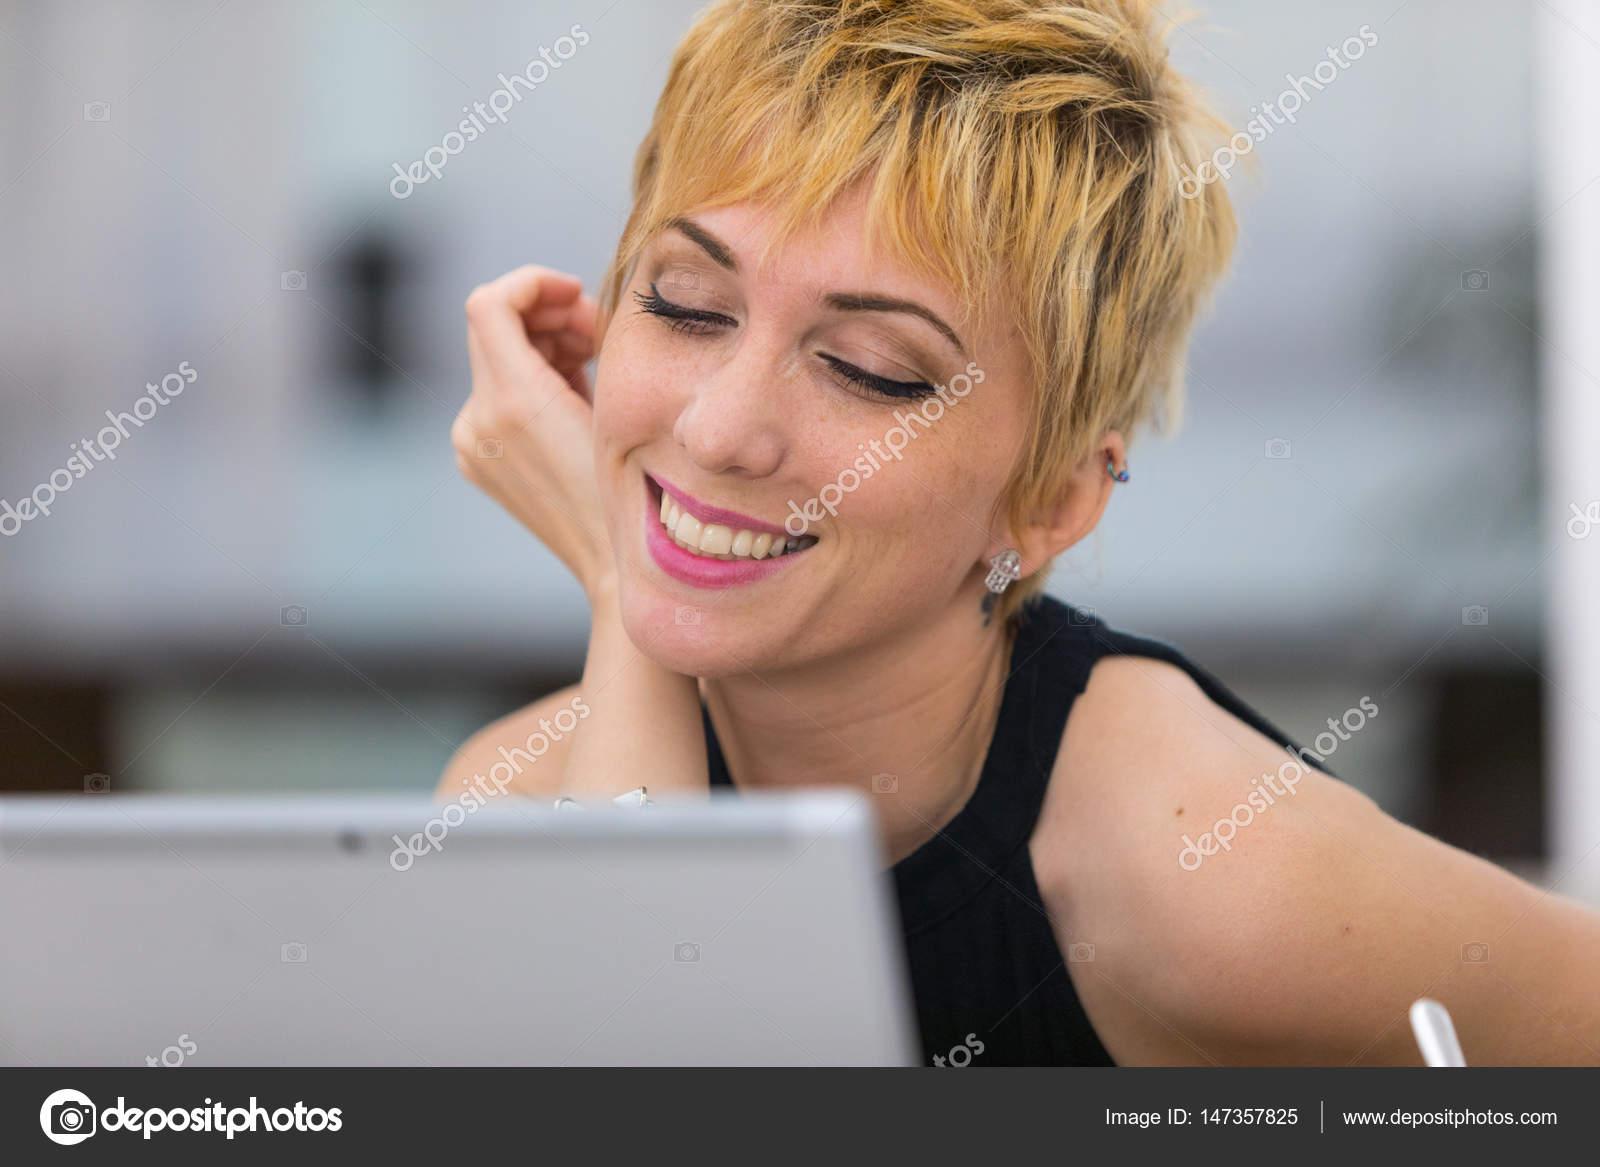 Знакомства по видео связи еротические знакомства